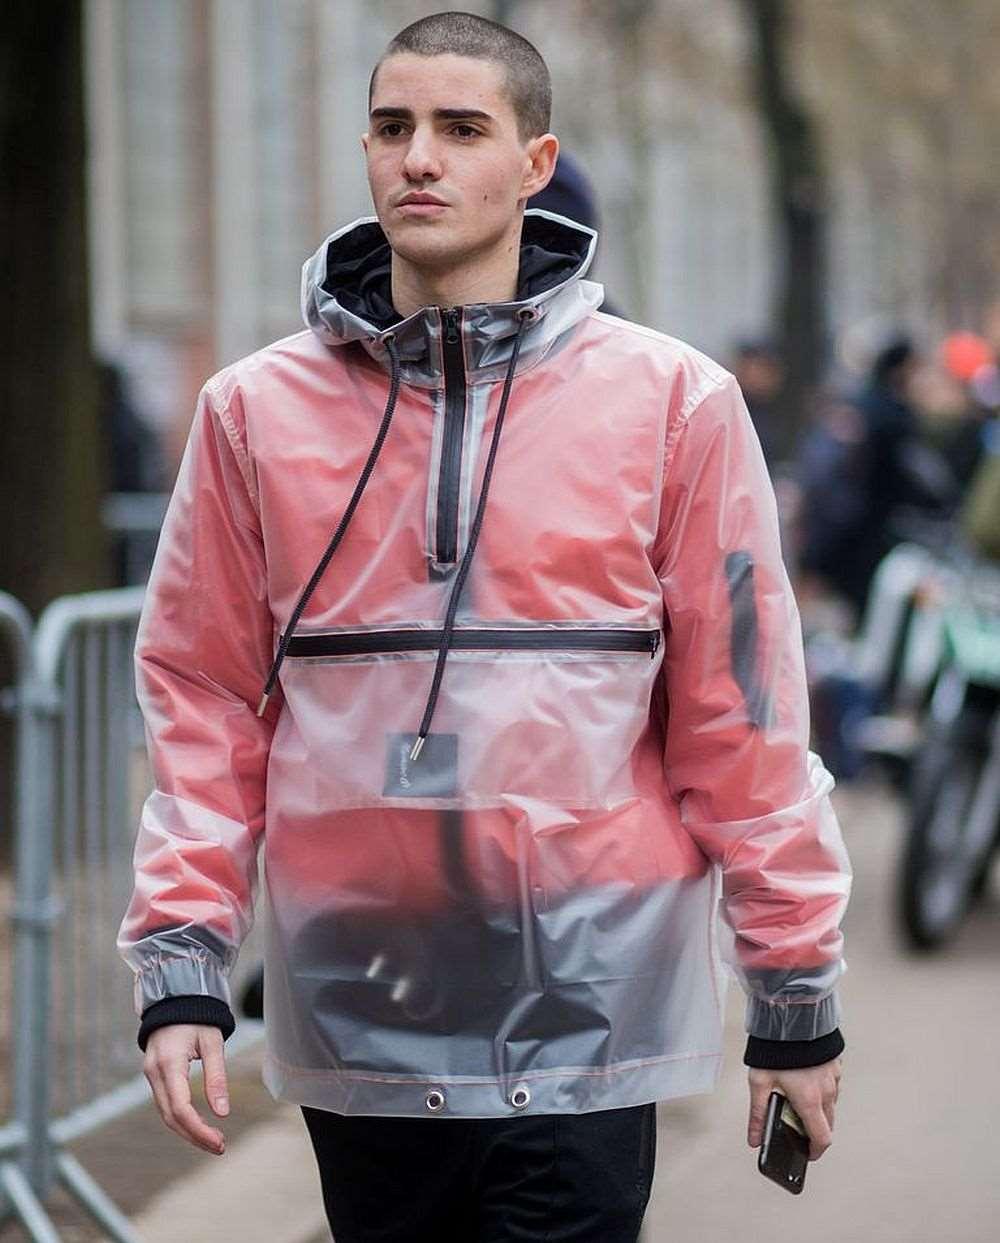 6cd47f03d1c Αδιάβροχο, το πιο στιλάτο παλτό